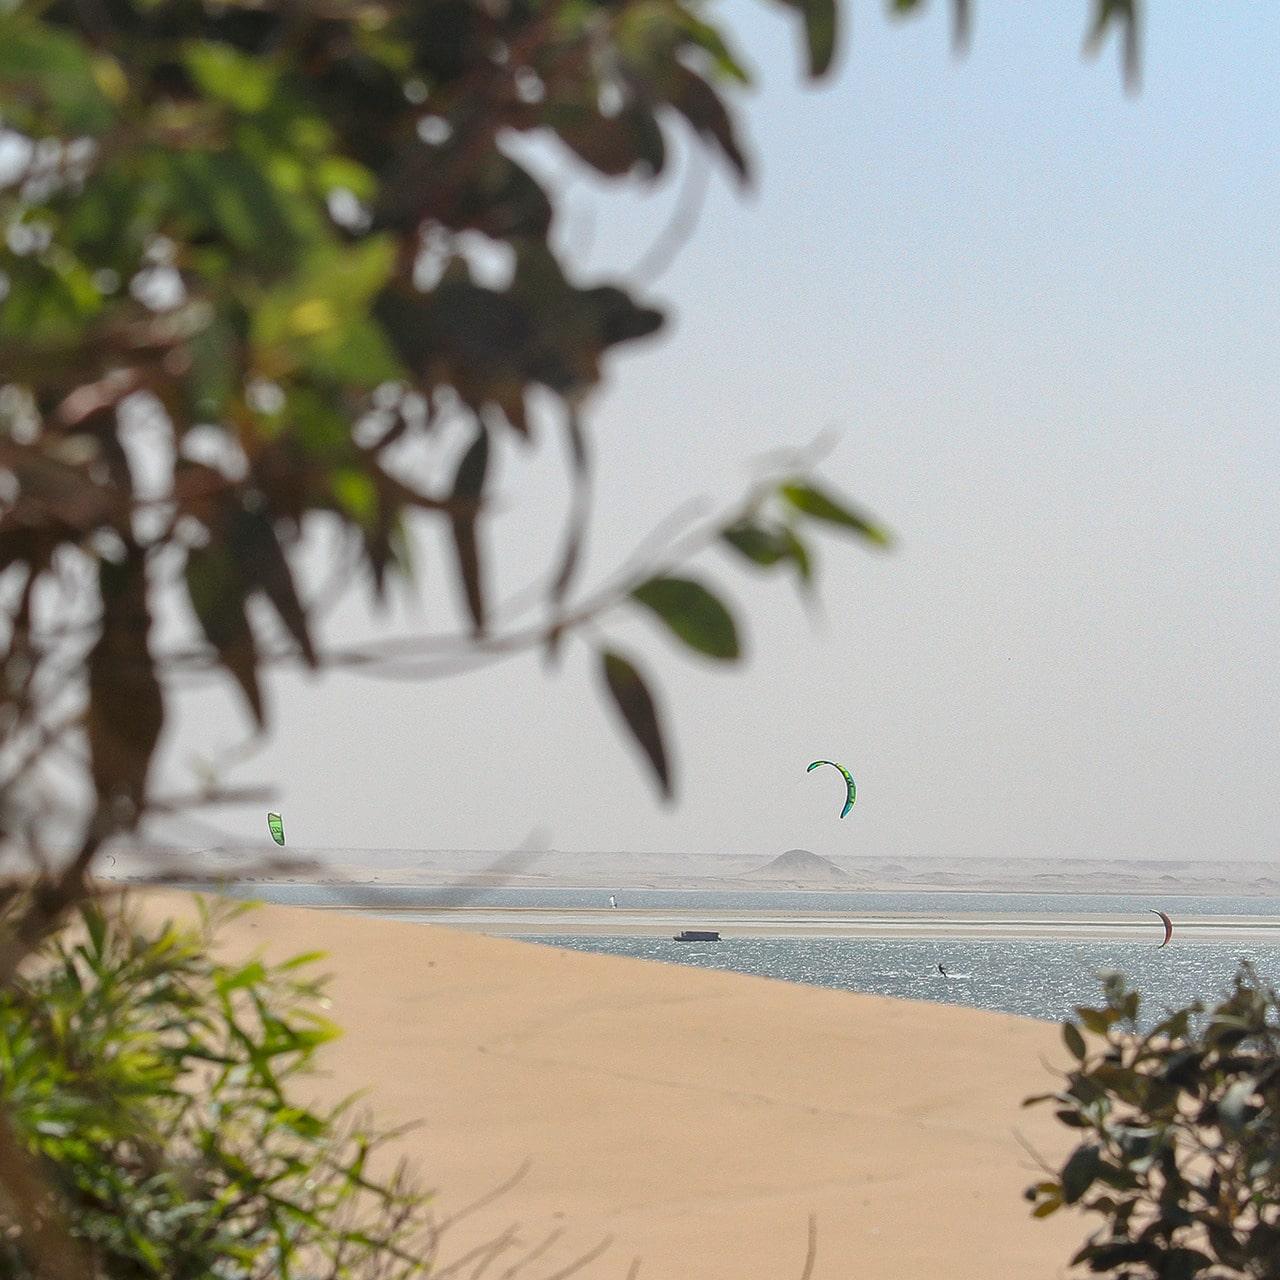 dakhla-kite